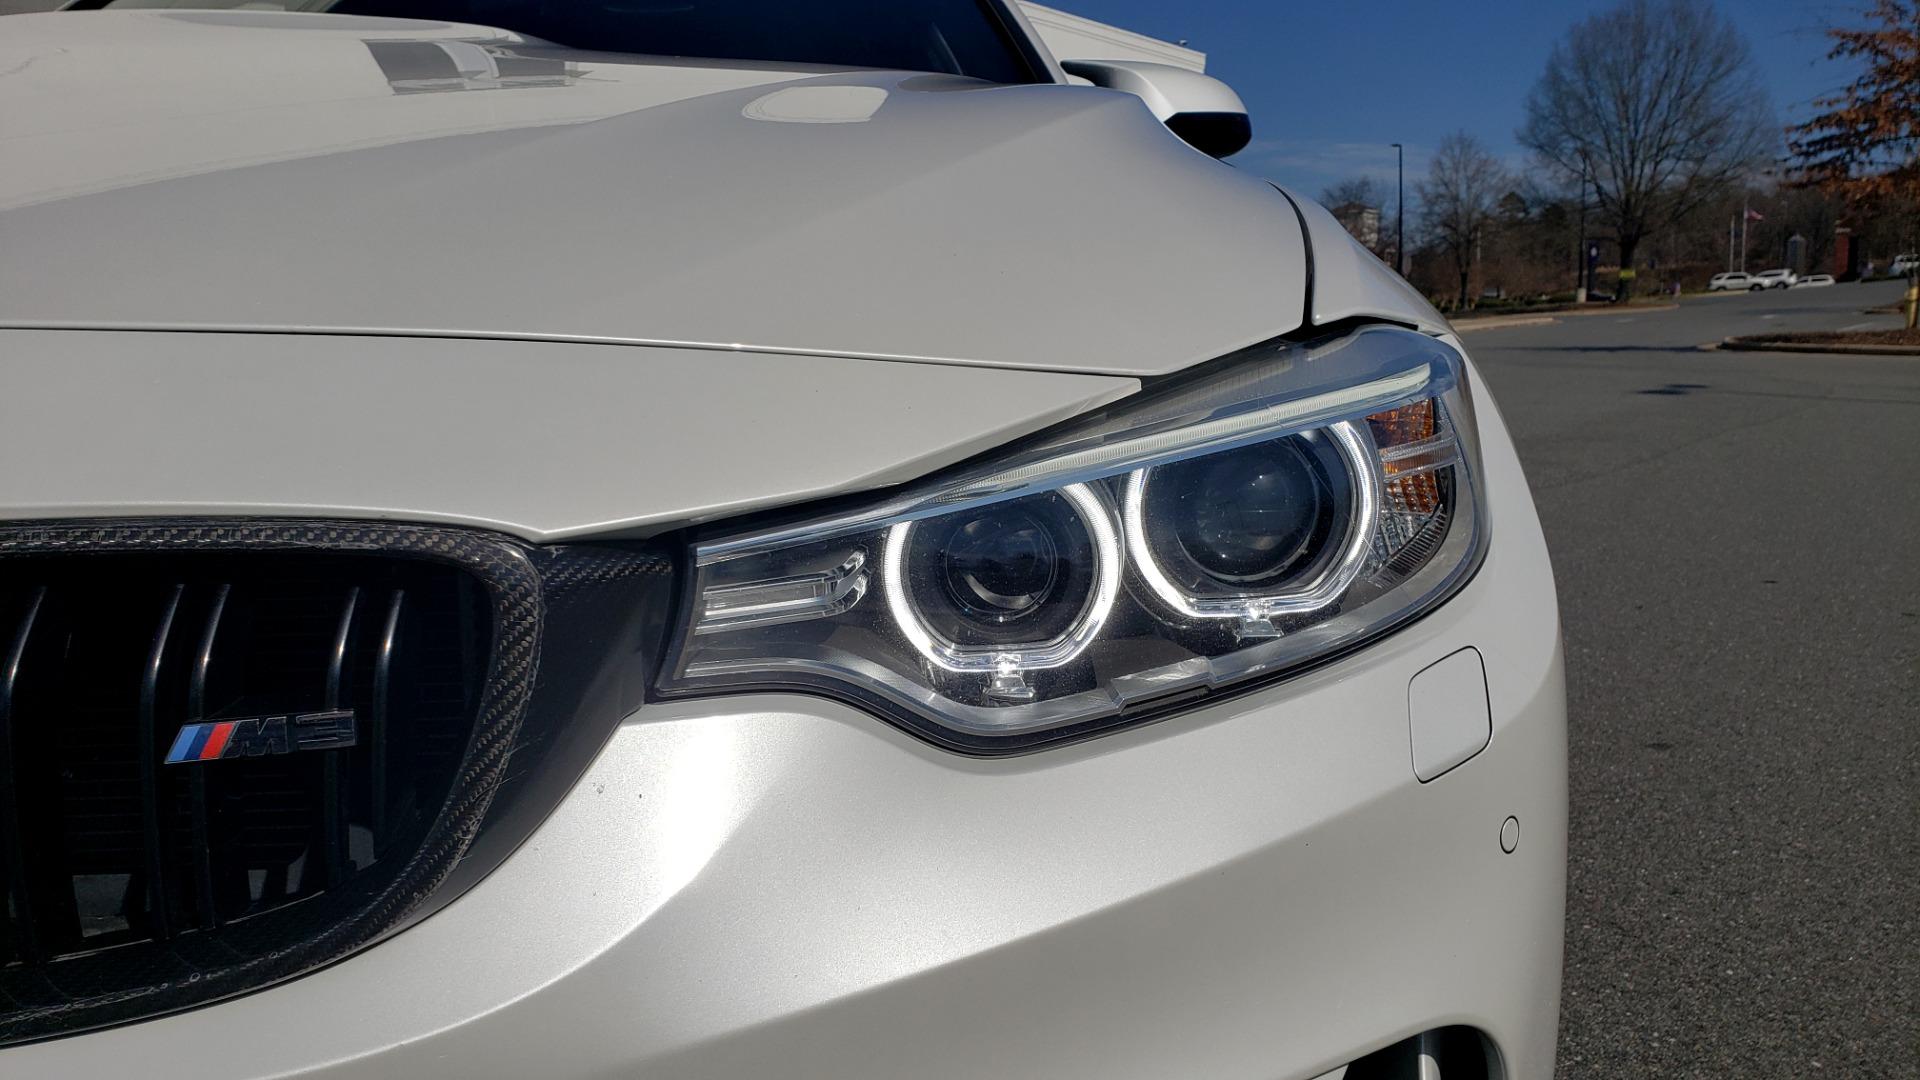 Used 2016 BMW M3 SEDAN / EXECUTIVE PKG / M-SUSPENSION / HARMAN/KARDON SOUND for sale Sold at Formula Imports in Charlotte NC 28227 18